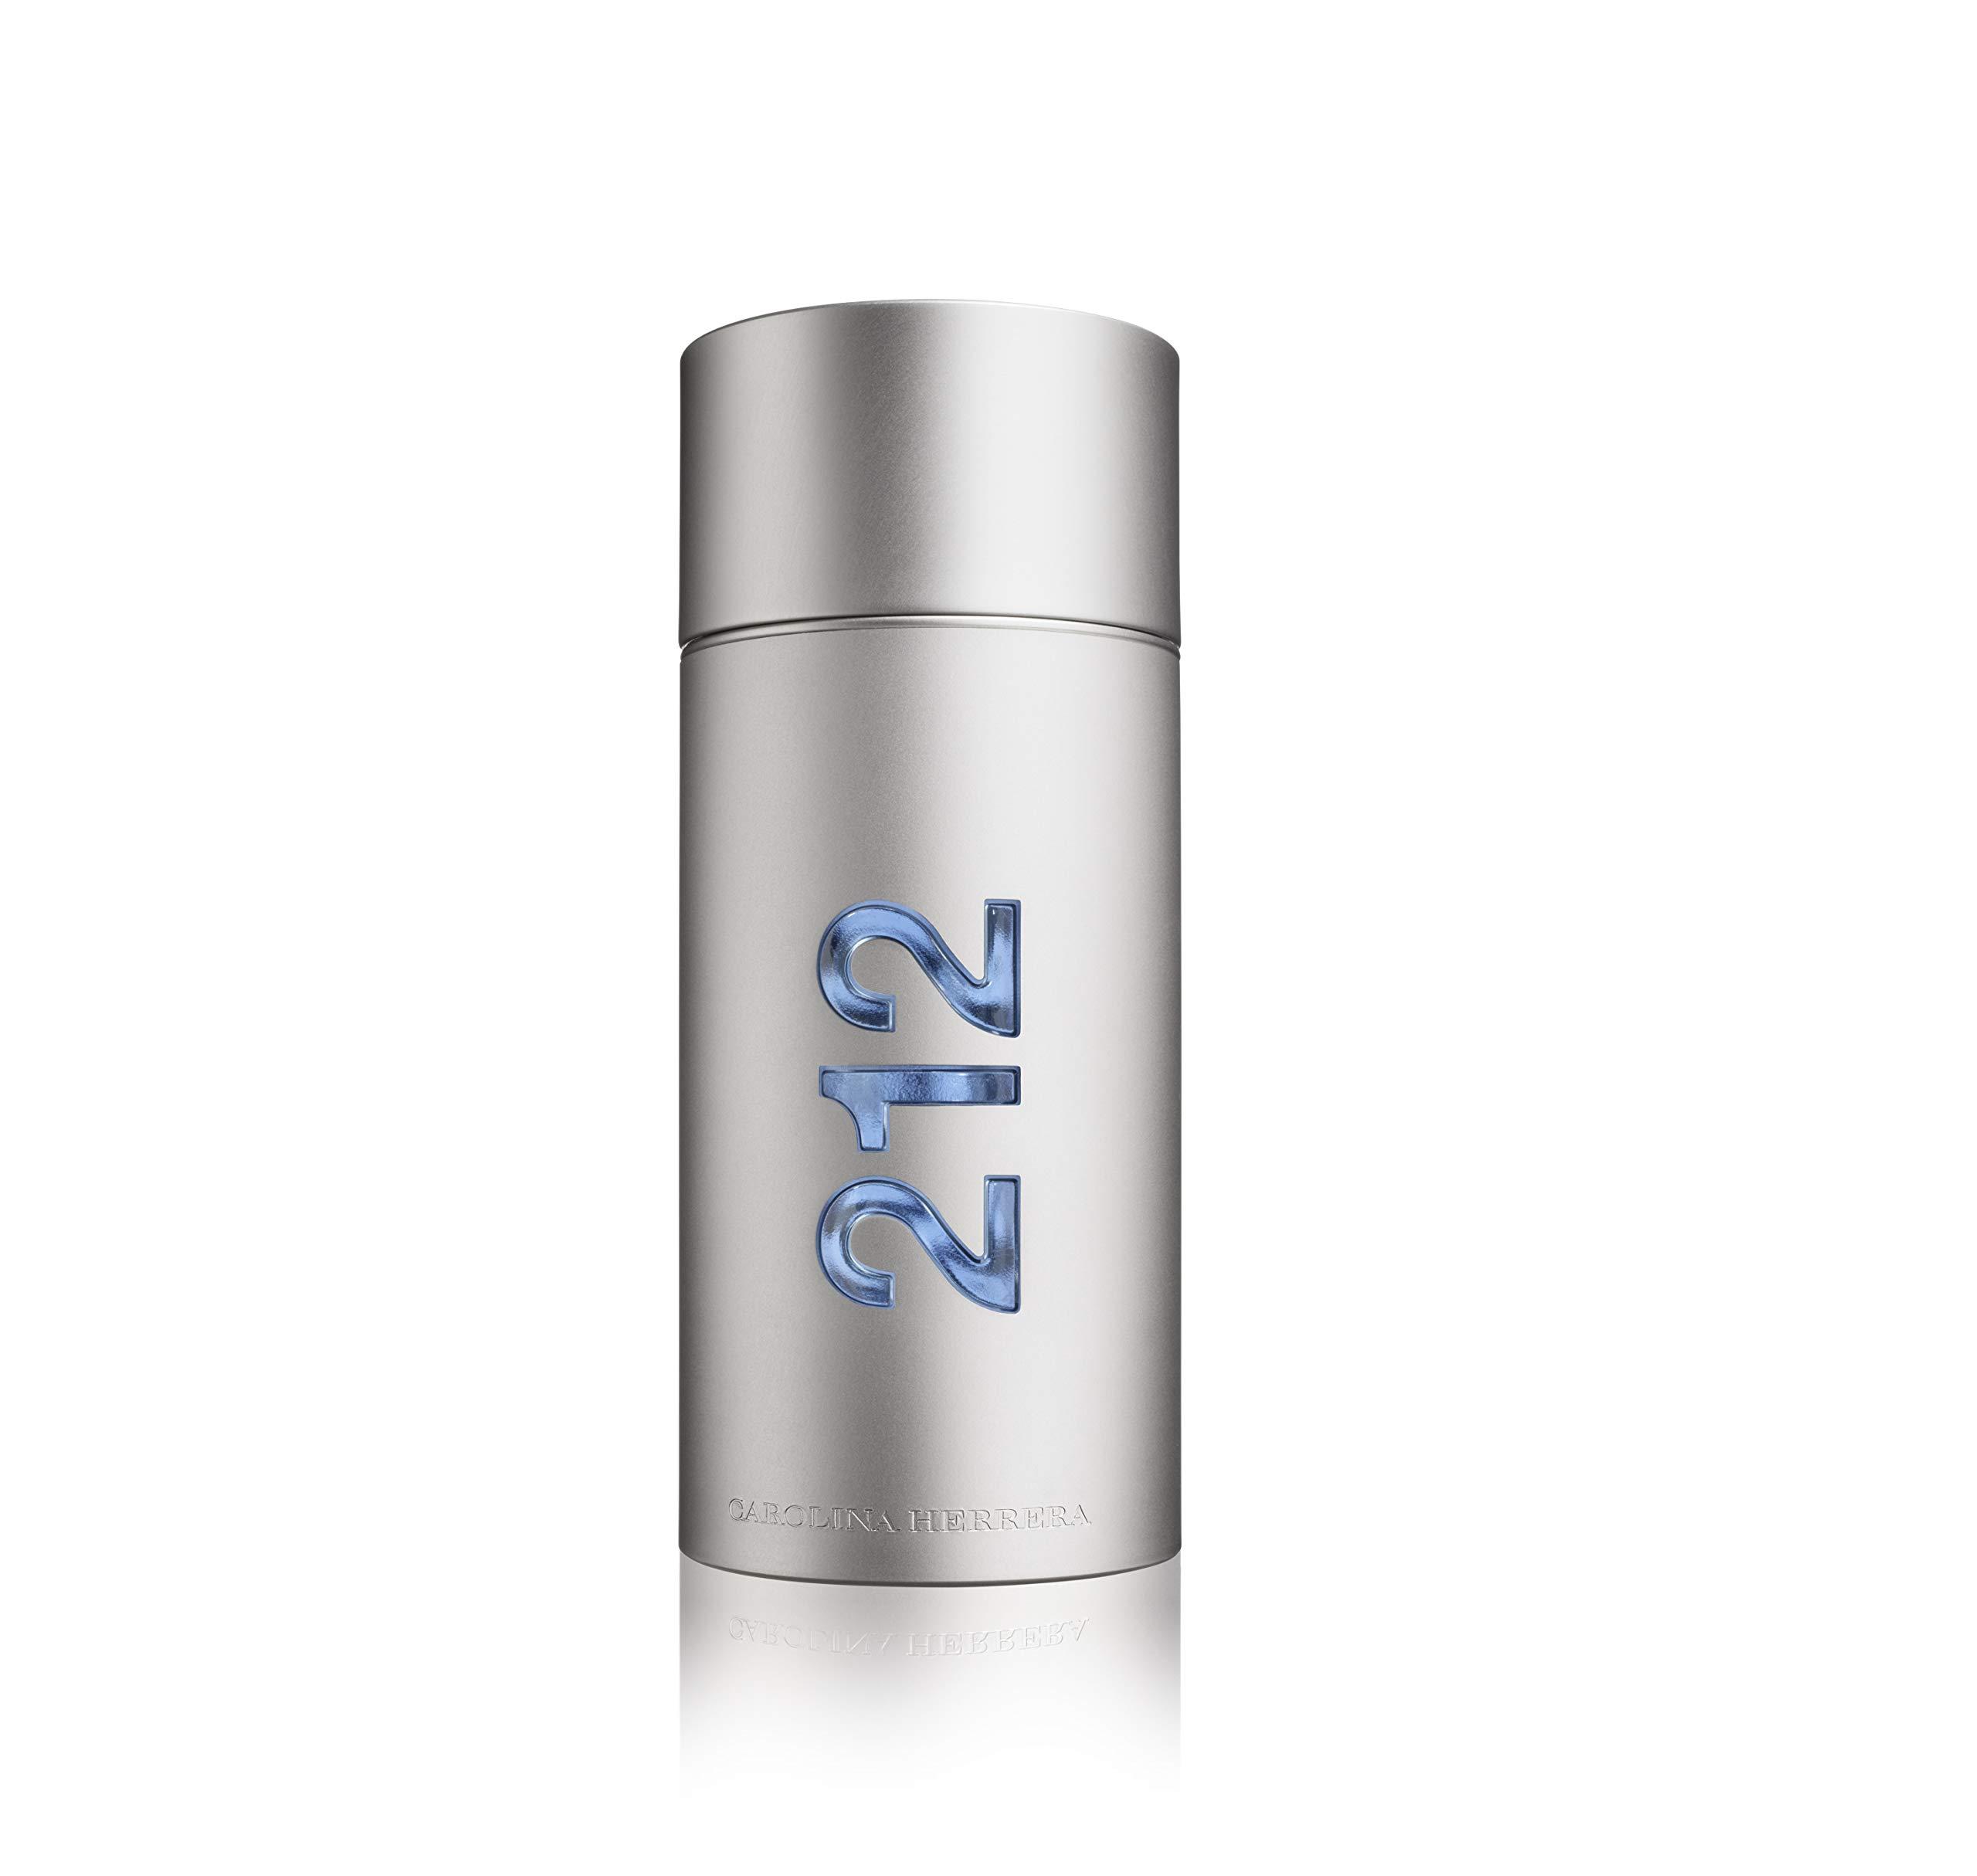 dd32e0d801c Amazon.com   Carolina Herrera 212 NYC Eau de Toilette Spray for Men ...